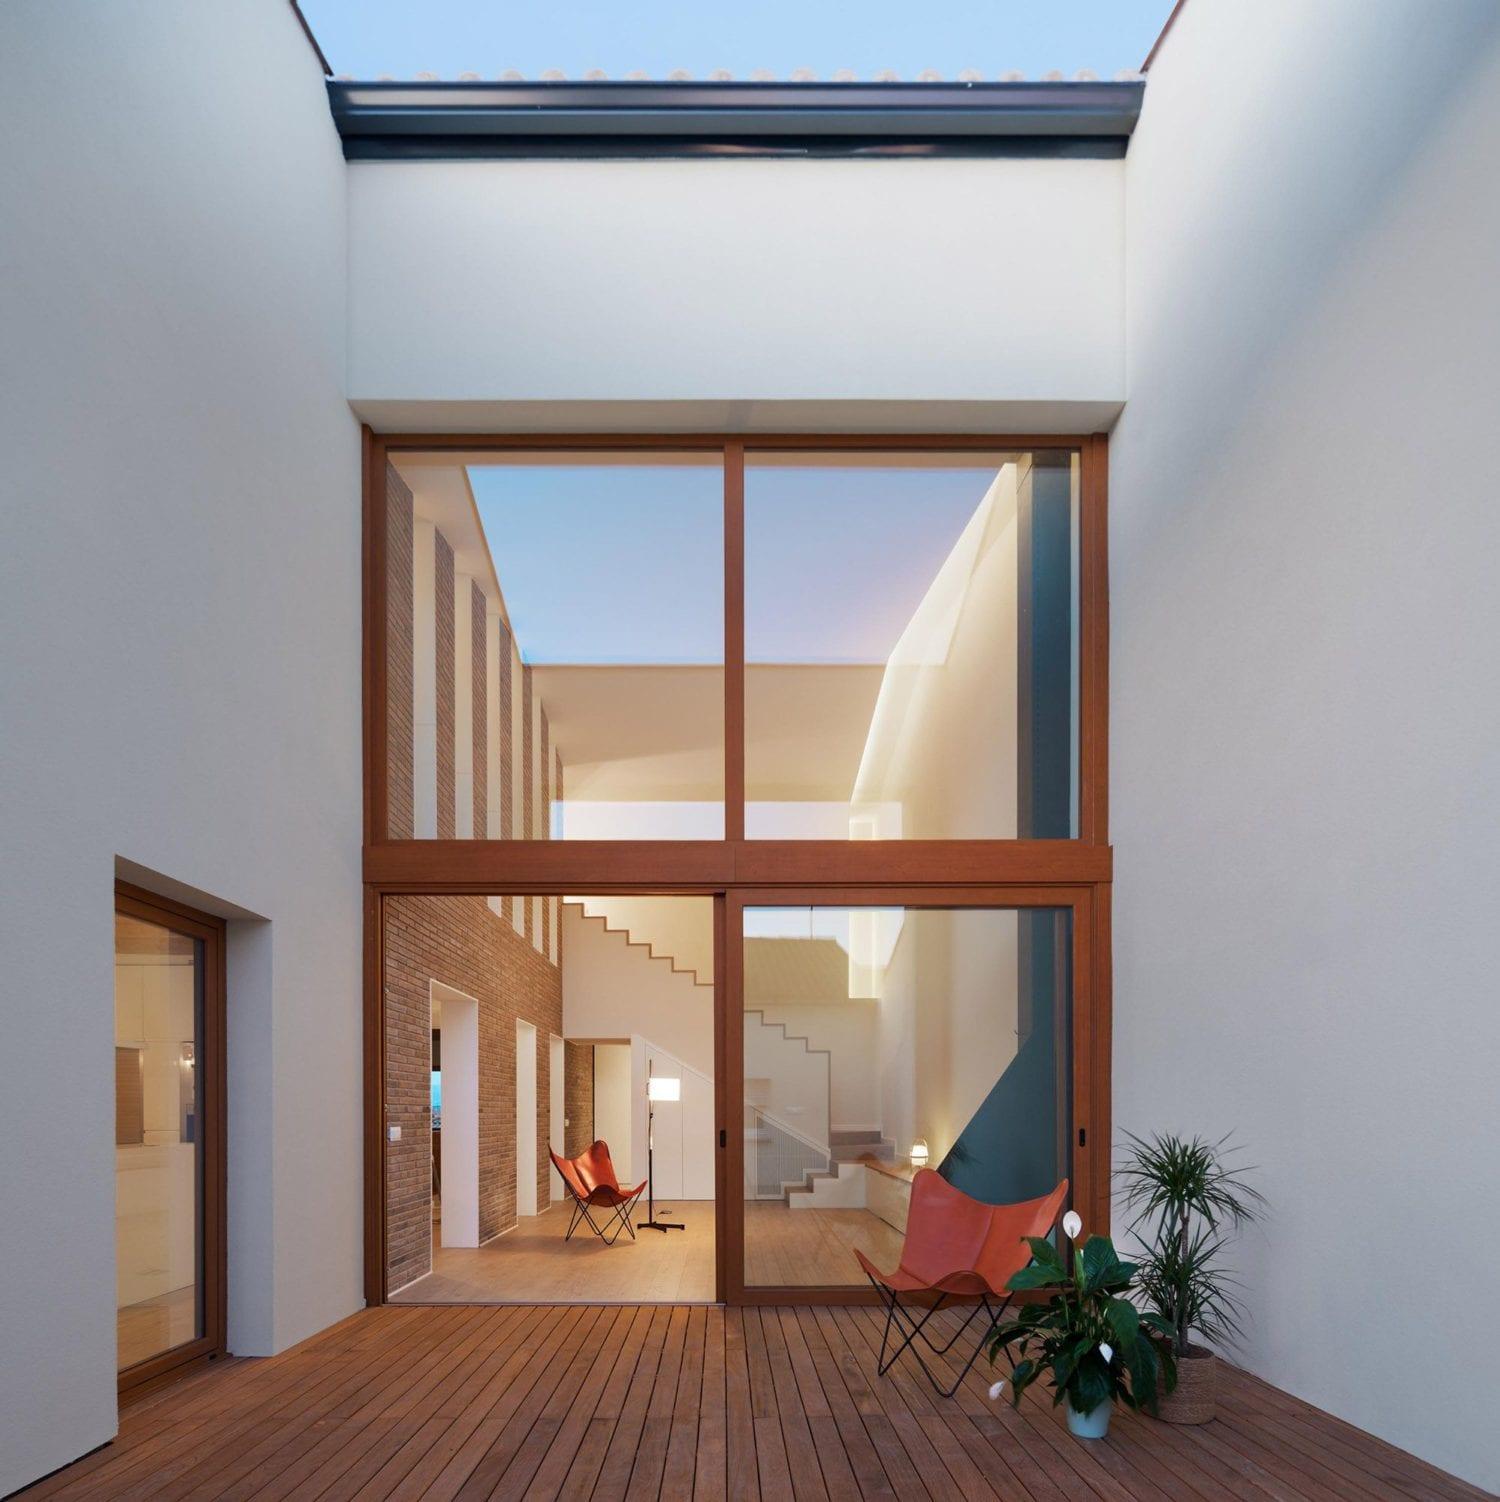 Cal Jordi & Anna House Renovation in Spain By Hiha Studio   Yellowtrace